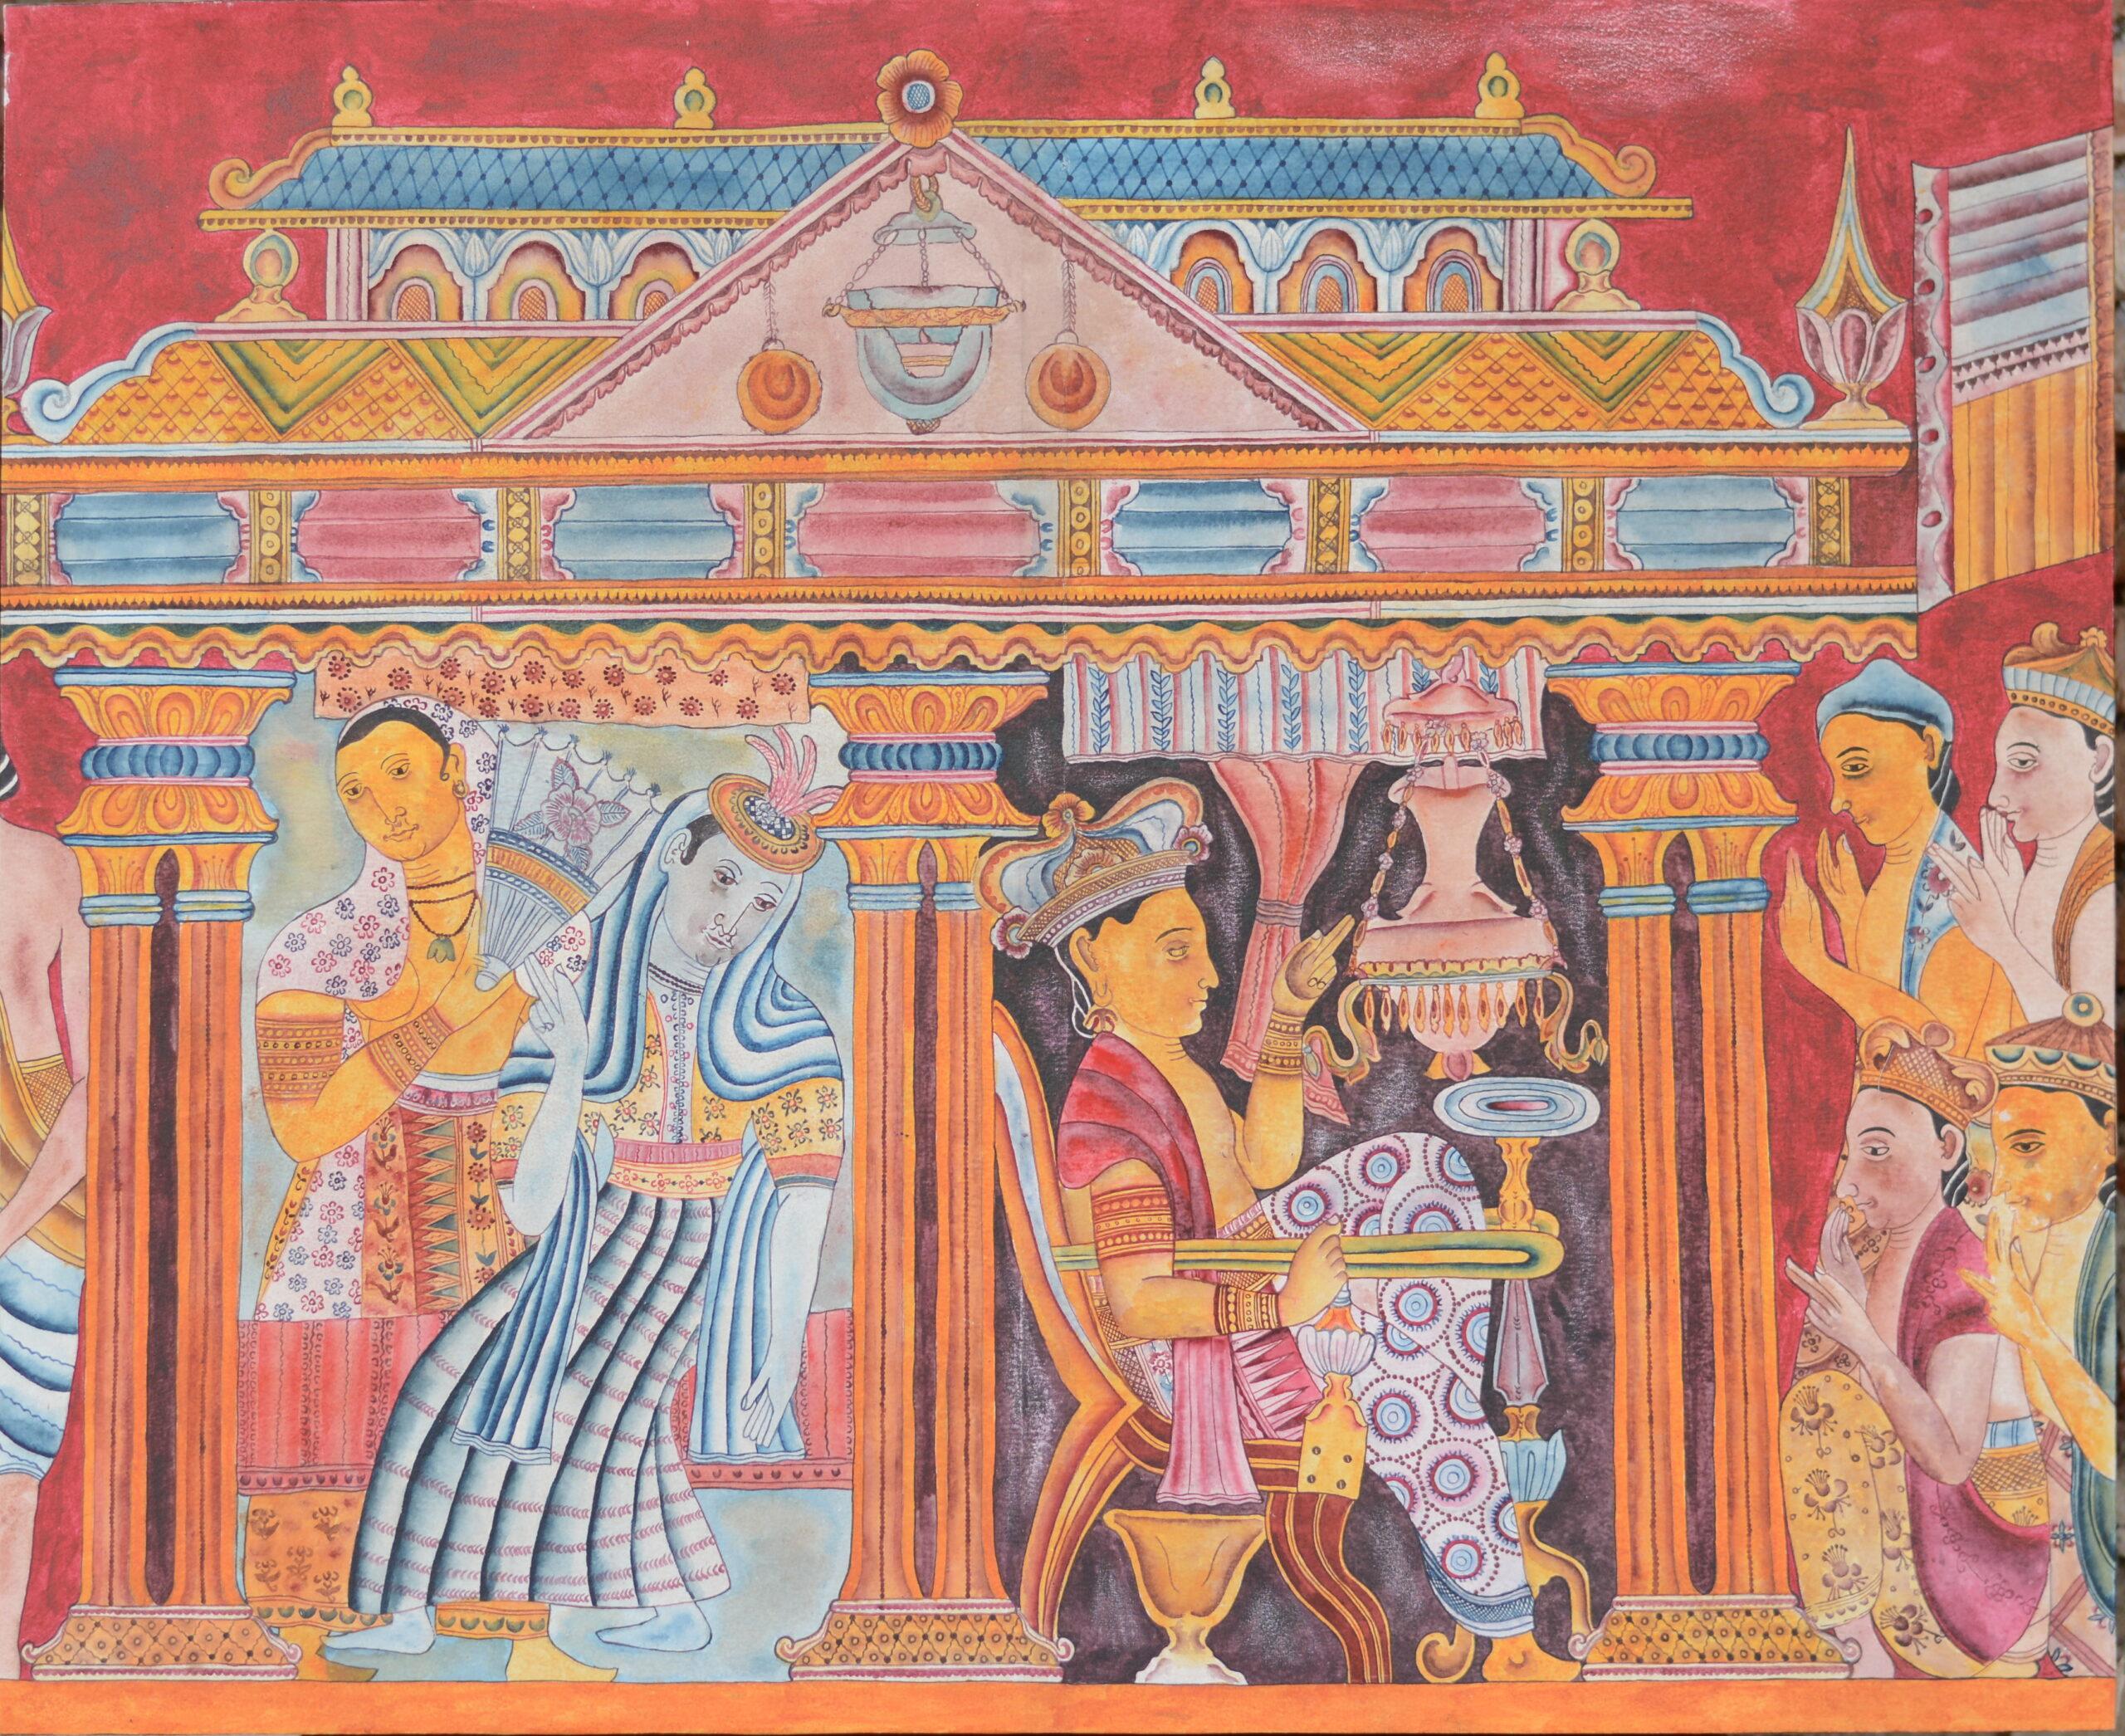 Traditional Arts (Kattahari Jathaka tale)_I.D.Lahiru Sampath